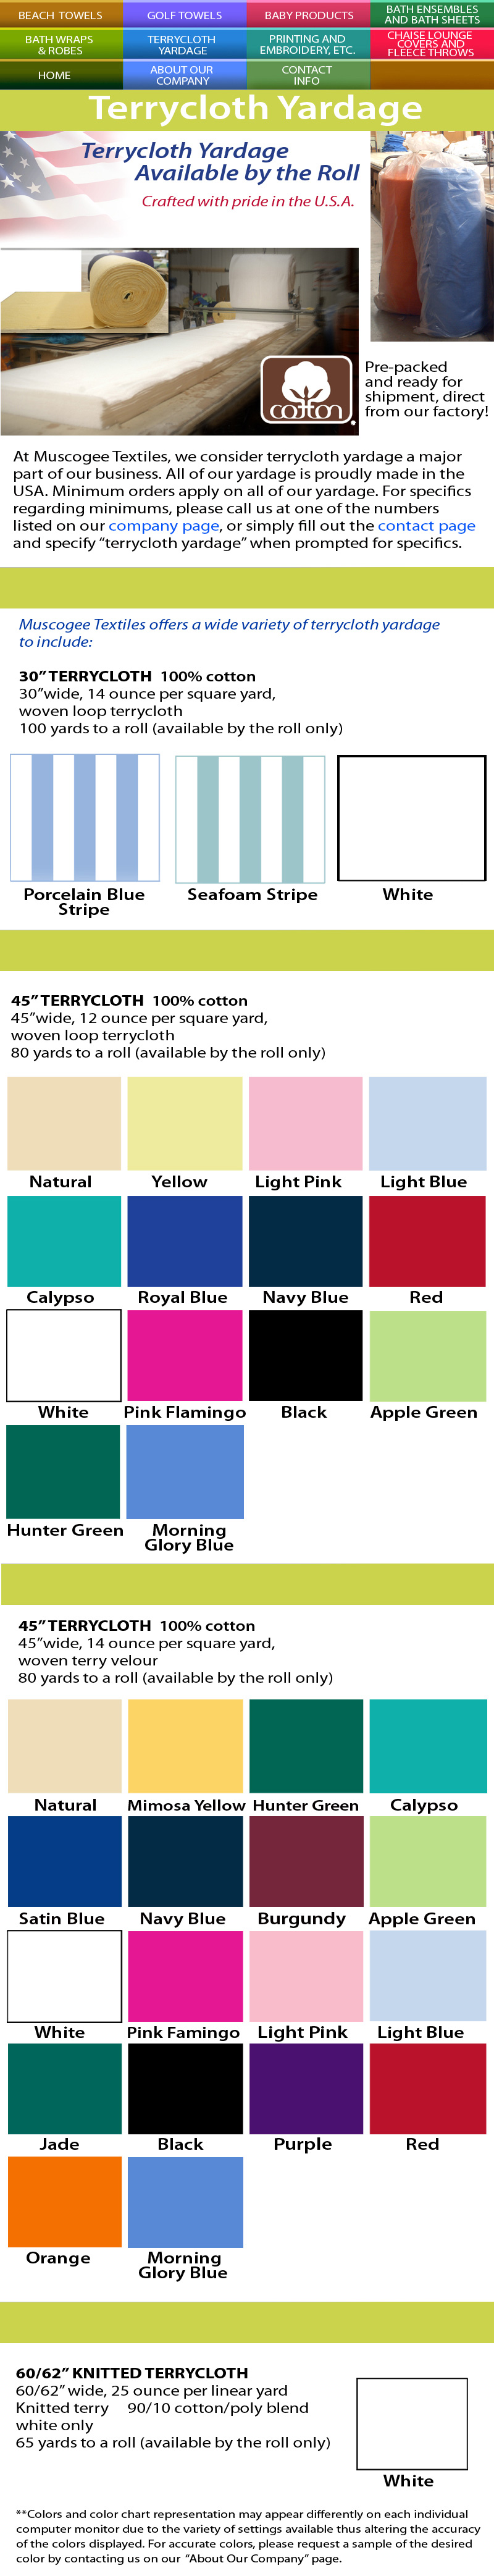 per square yard